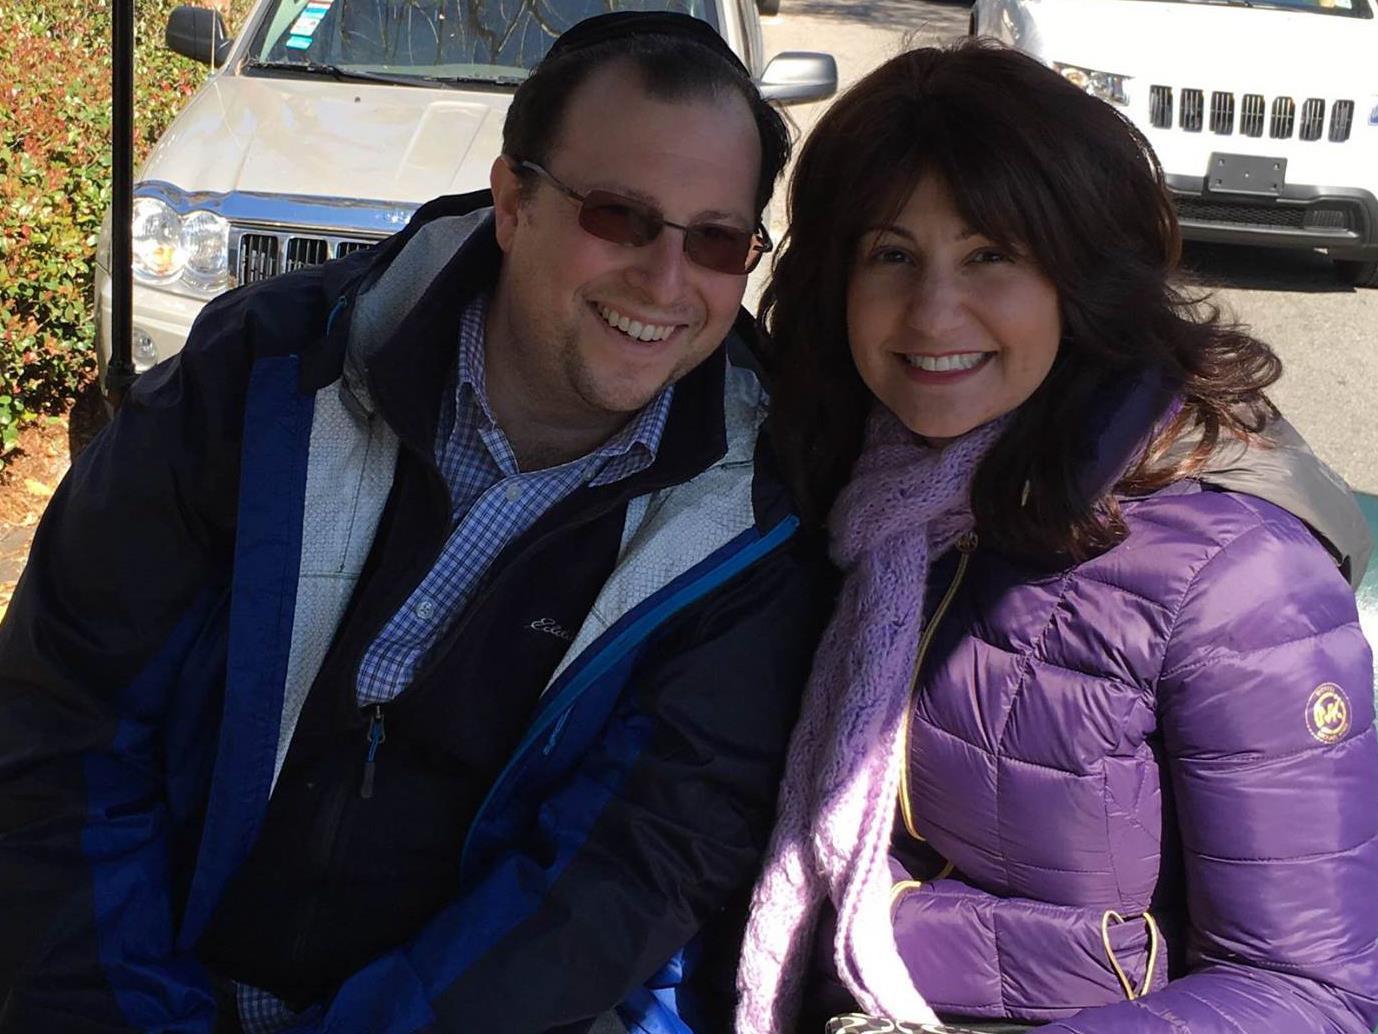 1238 Janie Engaged With Brad Through Jewish Matchmaker